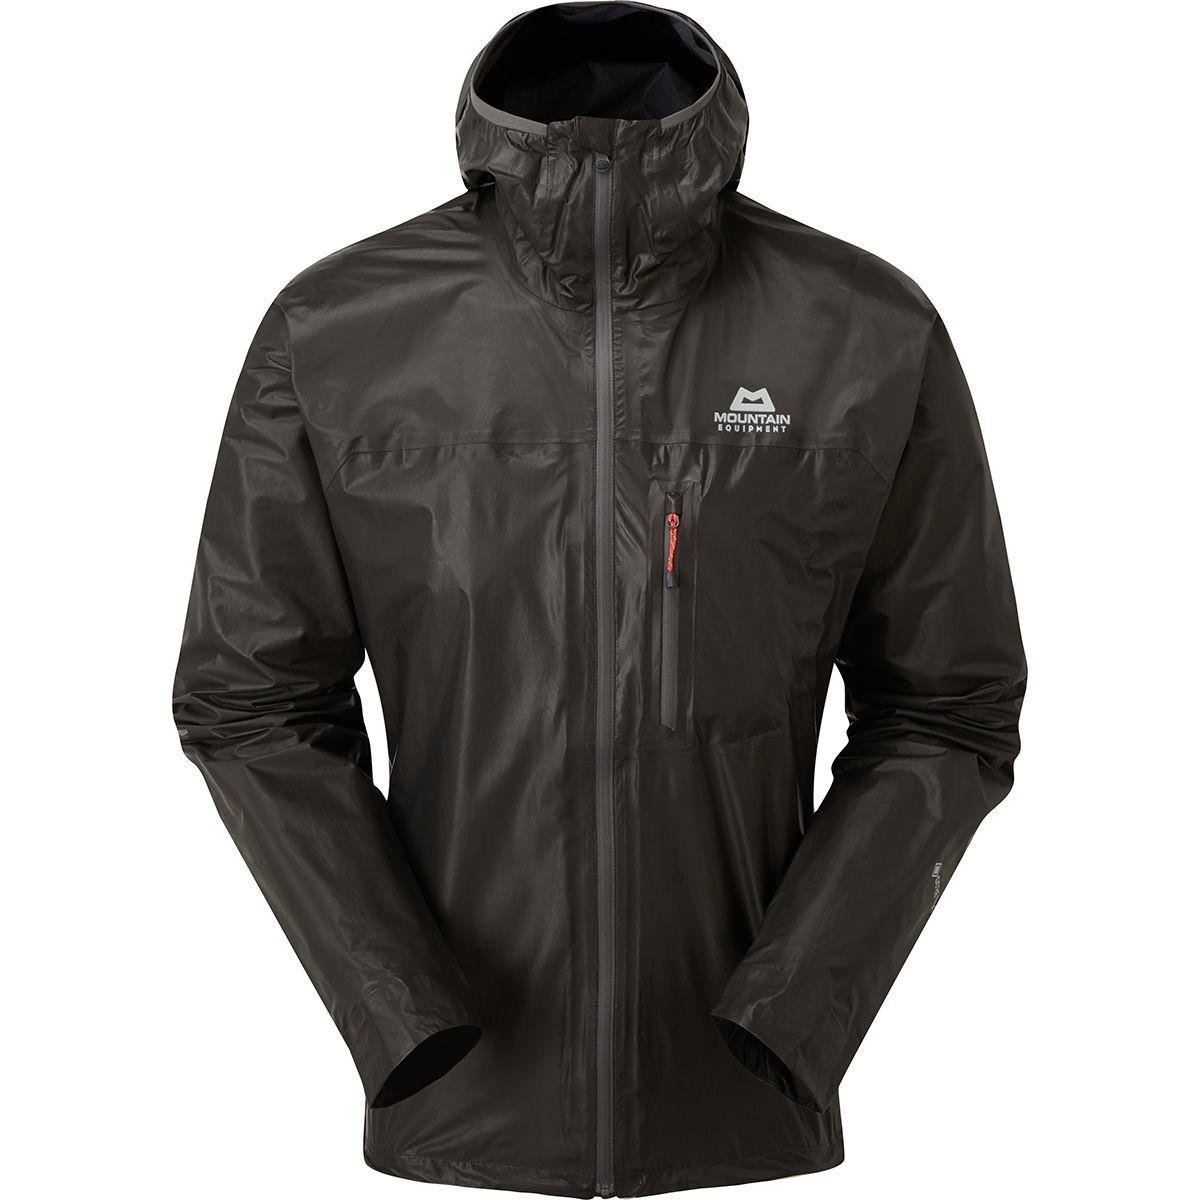 Mountain Equipment Impellor Shakedry Jacket